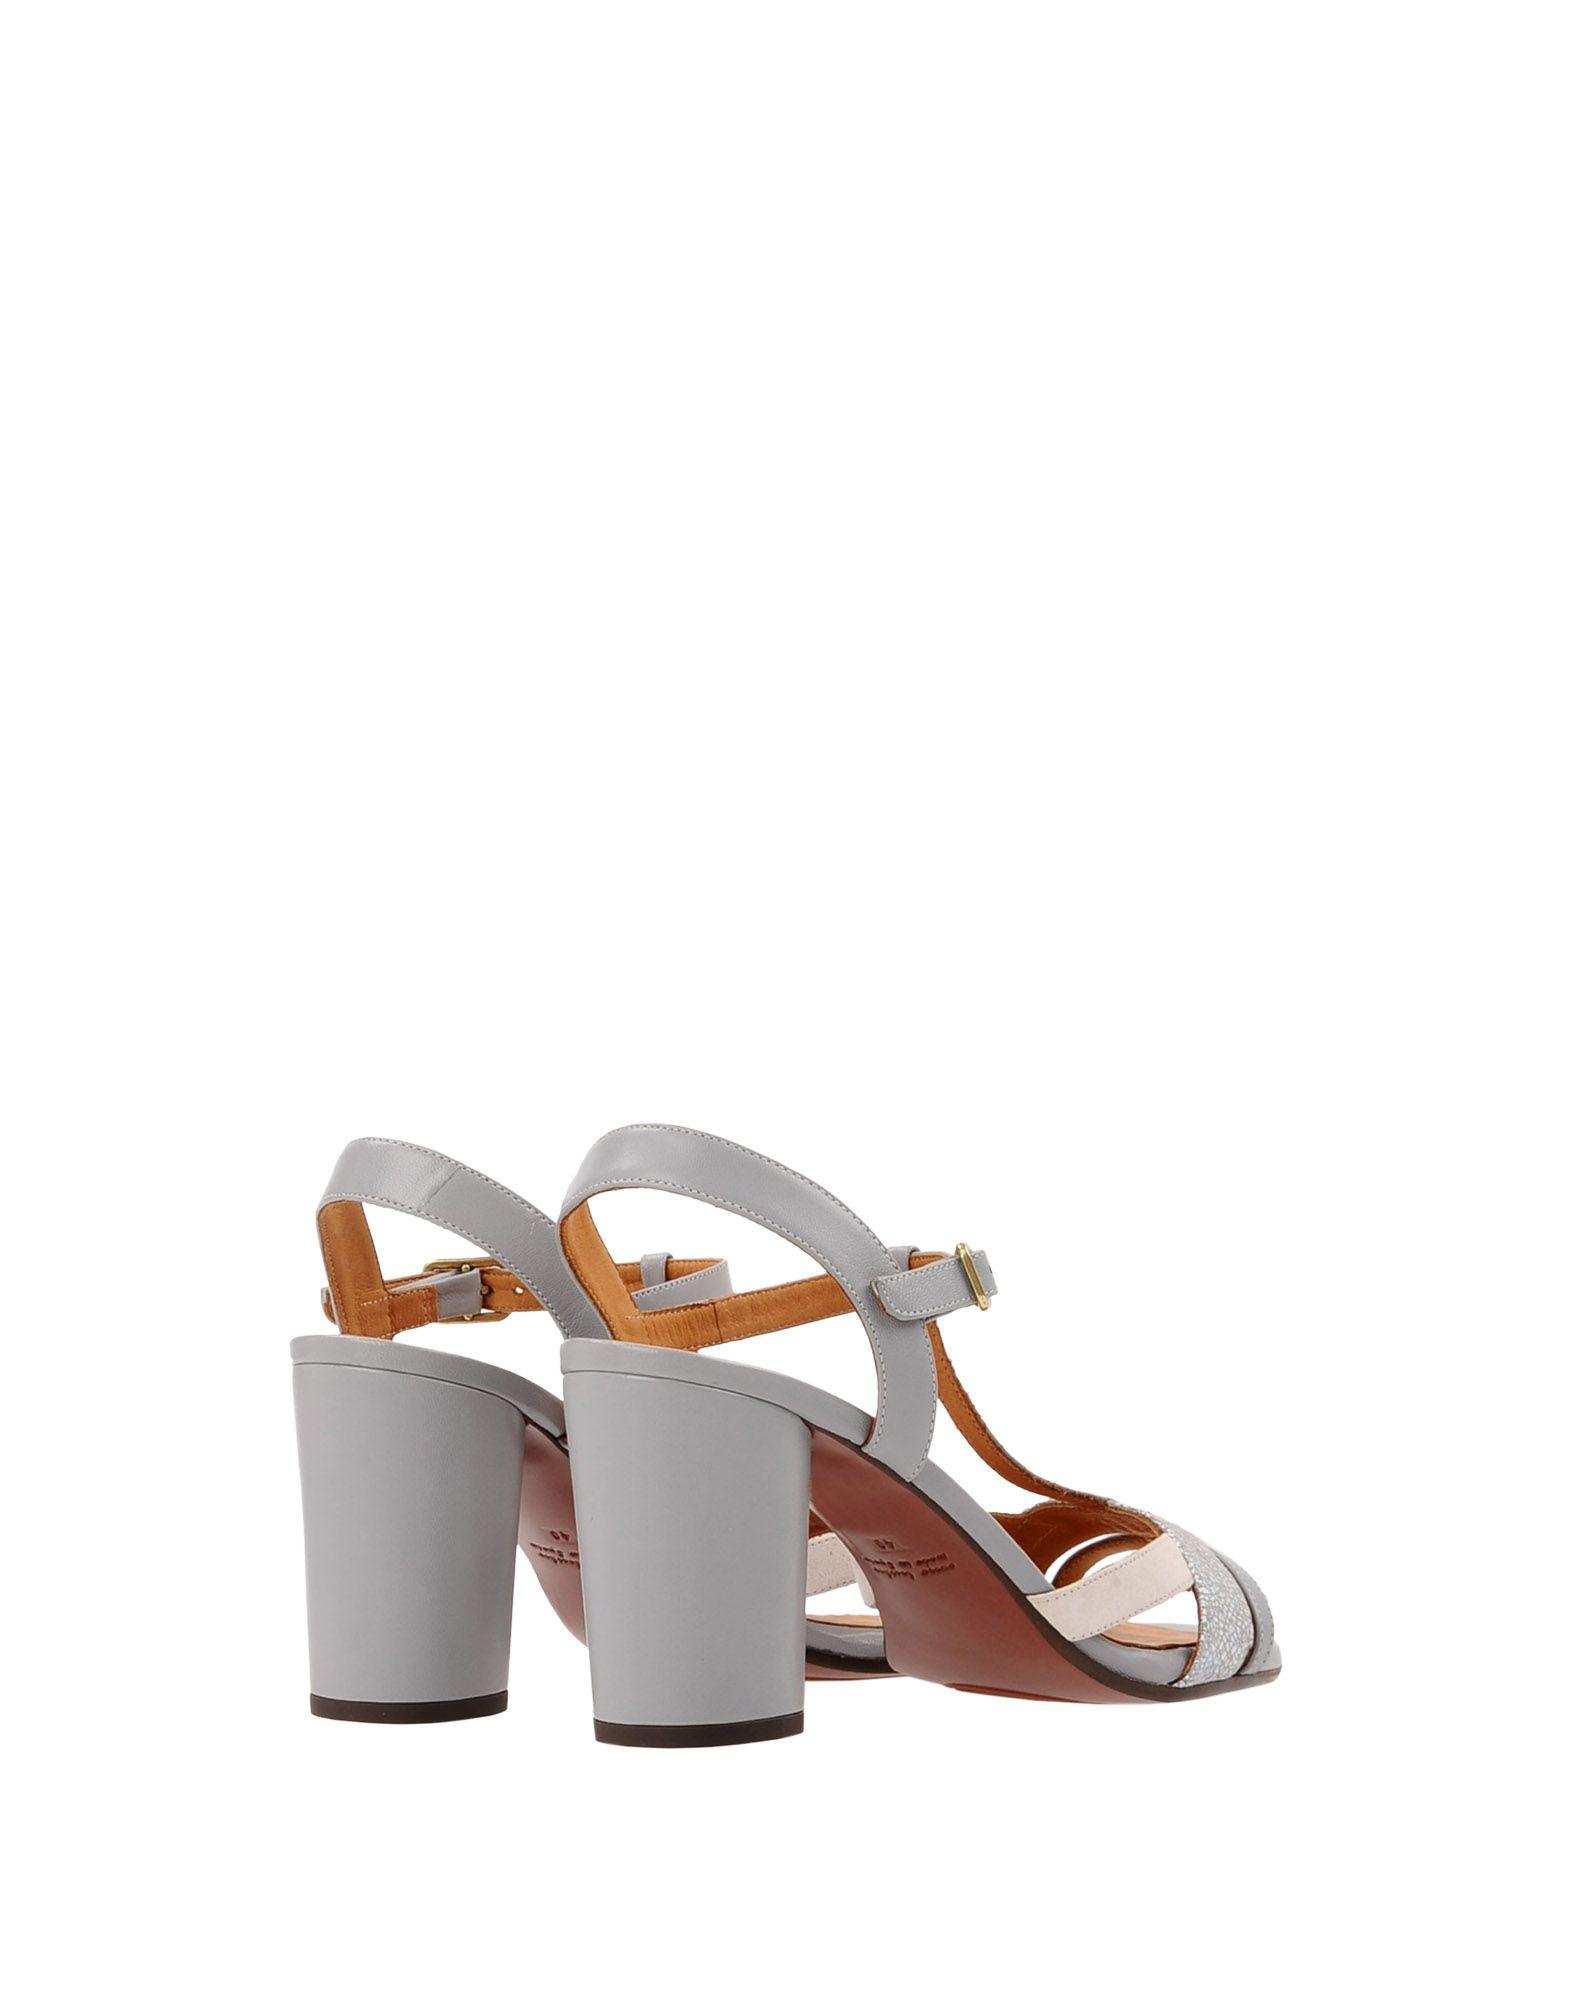 Sandales Chie Mihara Ujo - Femme - Sandales Chie Mihara sur